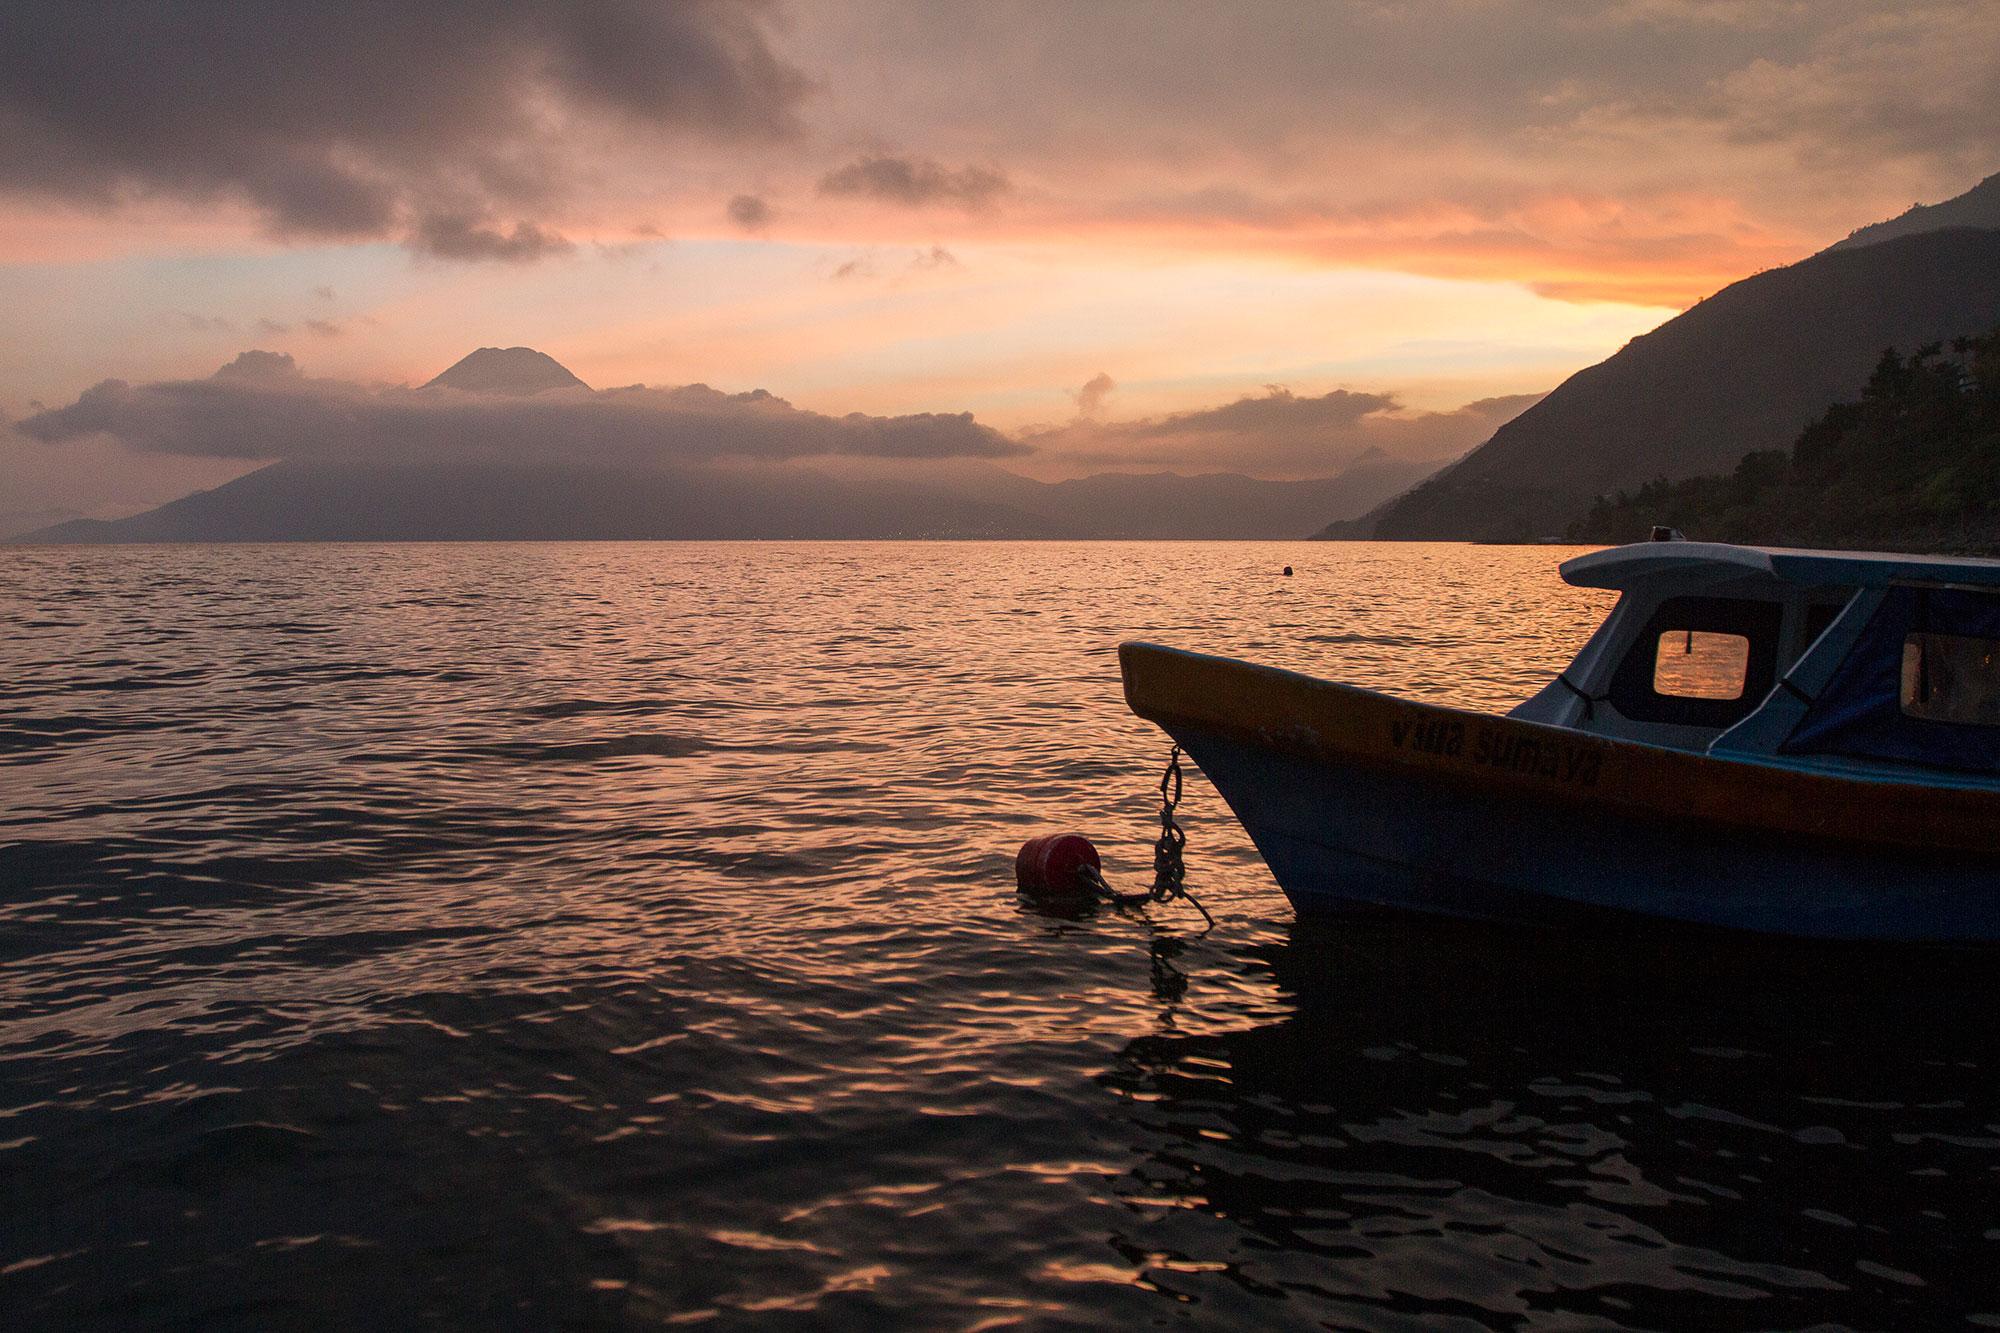 The shores of Lake Atitlán.